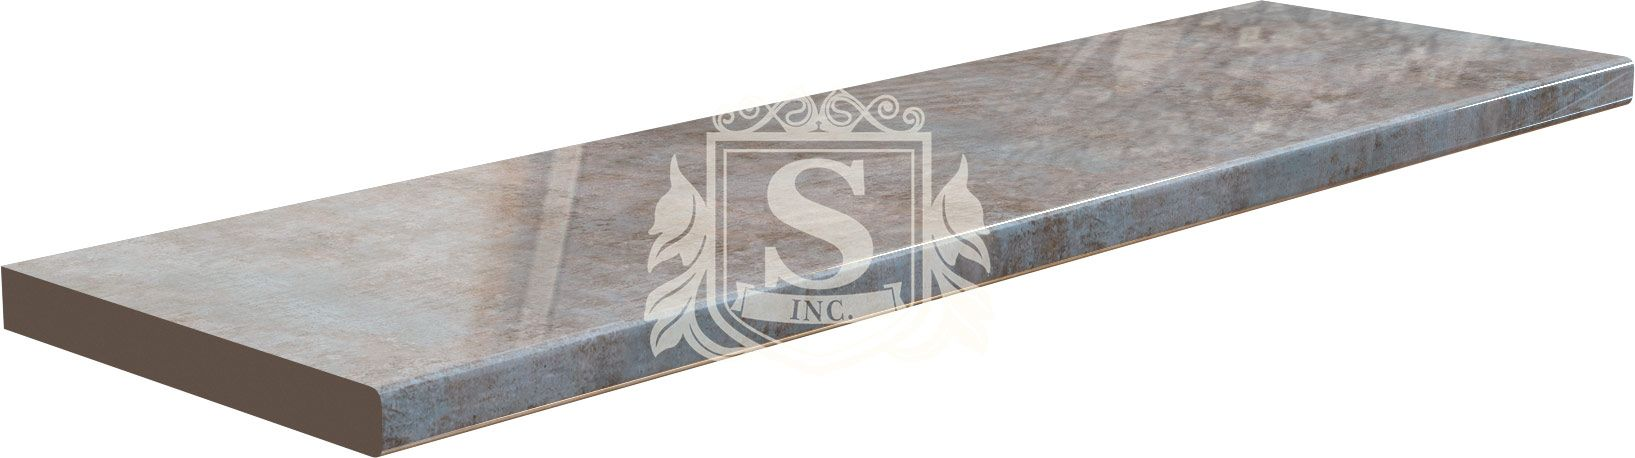 Столешница «Травентино» 1 м.п (28 мм)